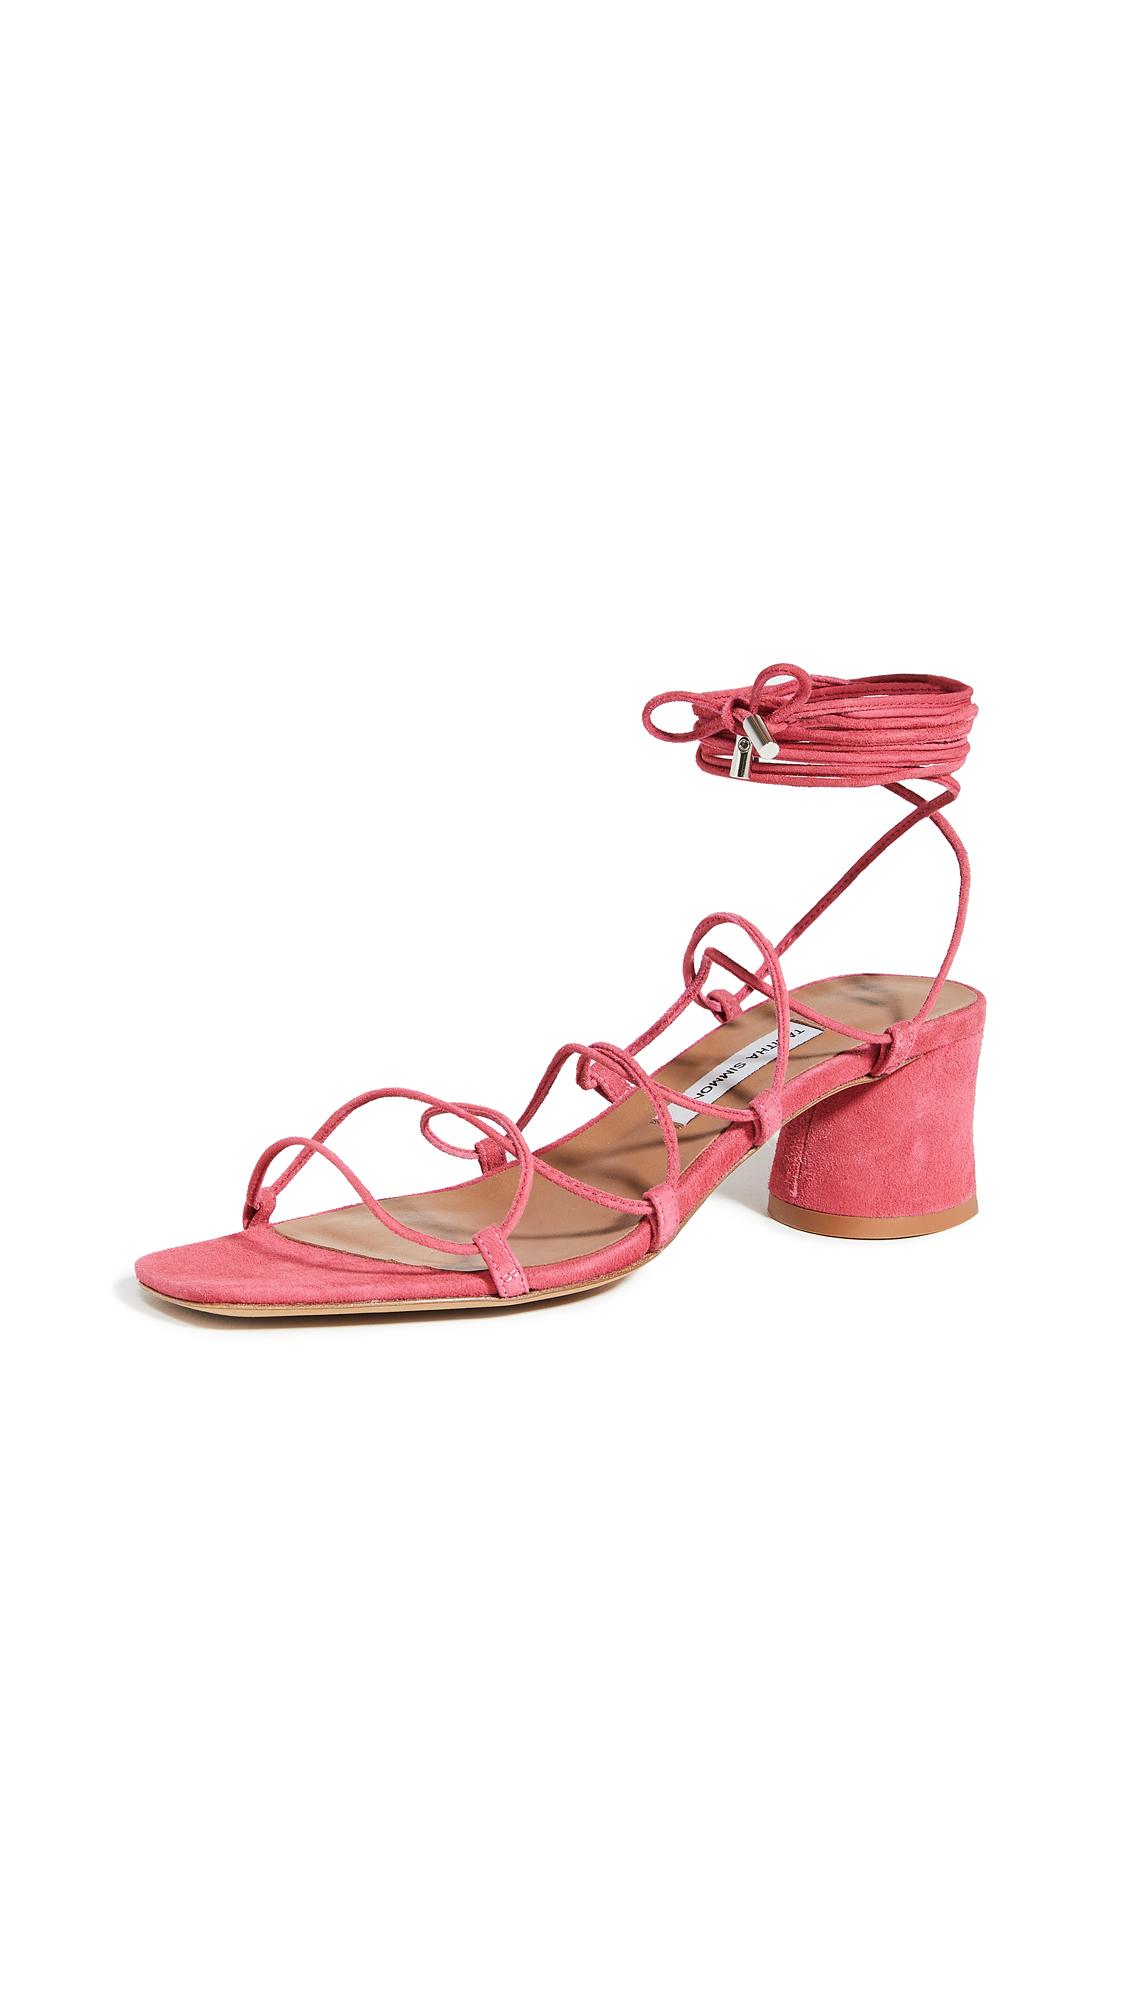 Tabitha Simmons Austen Sandals - 40% Off Sale